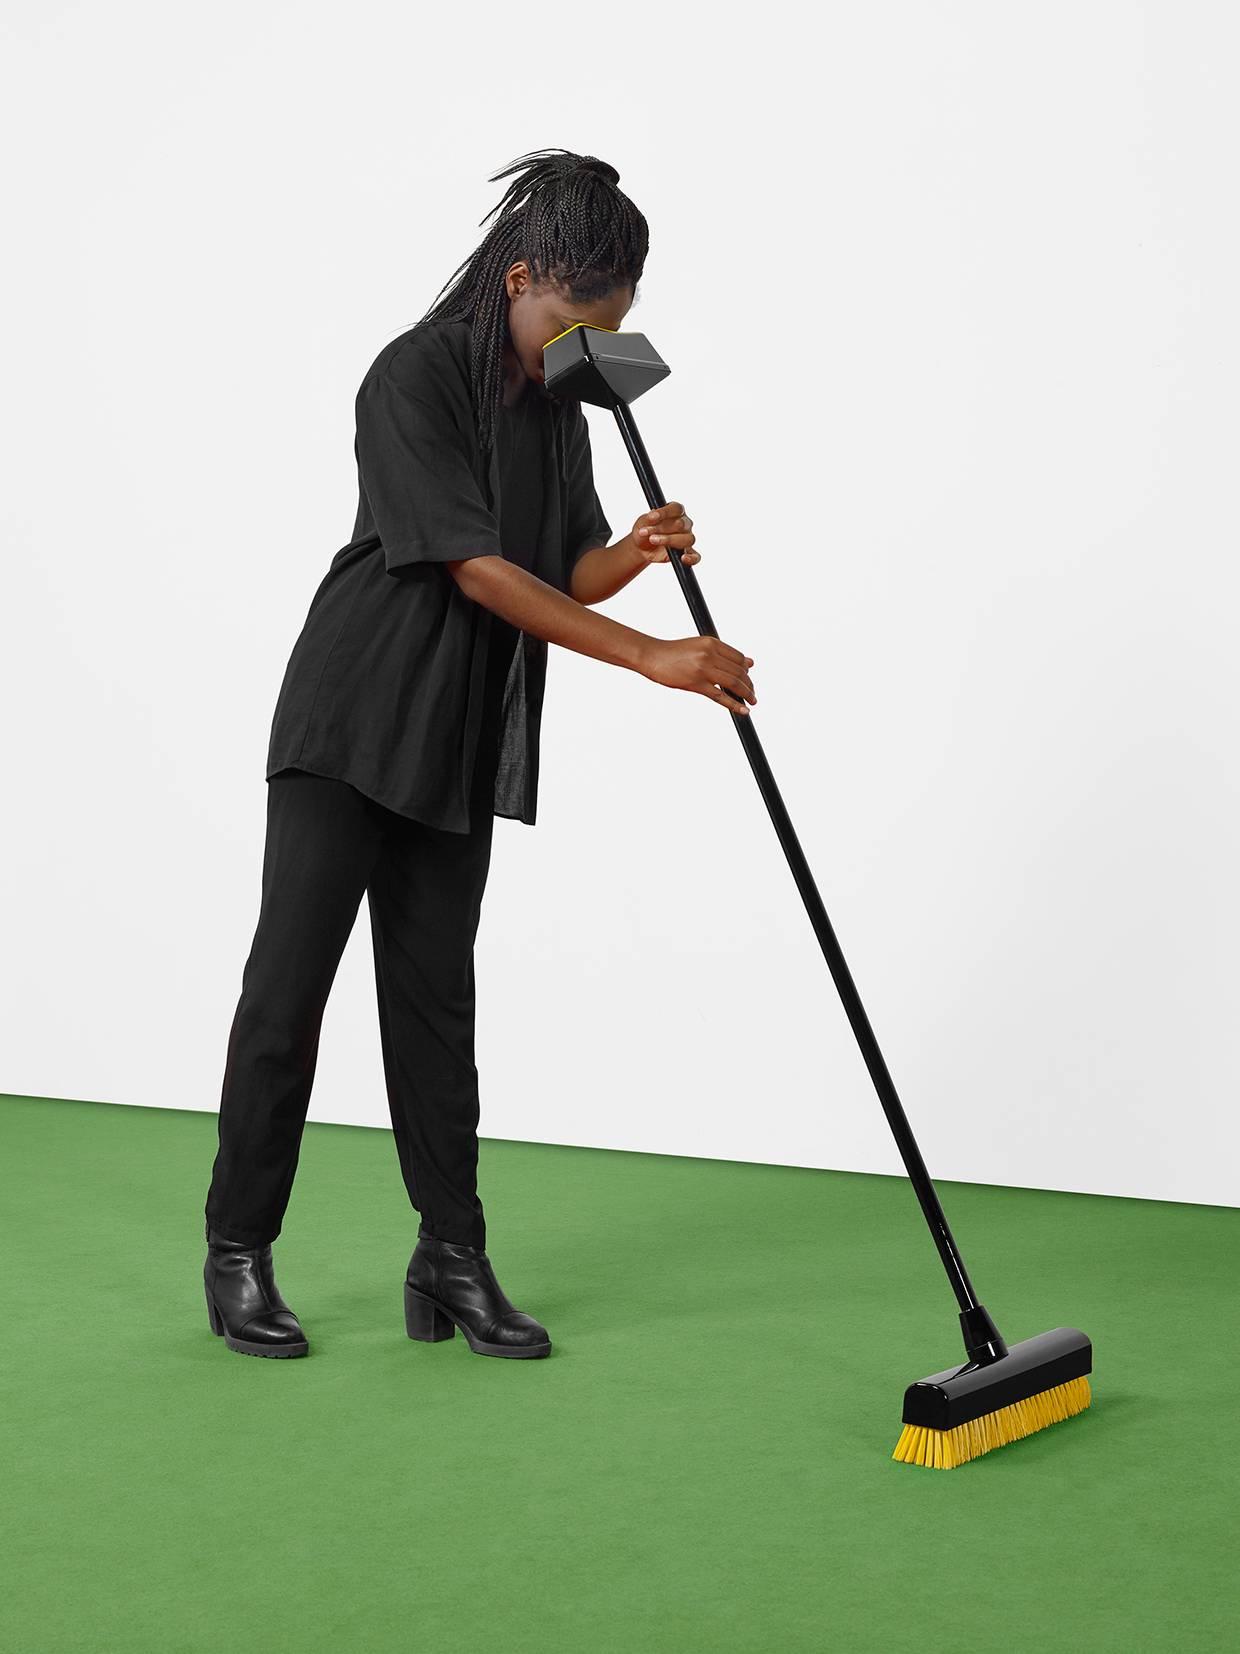 Broom Broom, מתוך התערוכה של ECAL, עבודה של /Erika Marthins & Hélène Portier